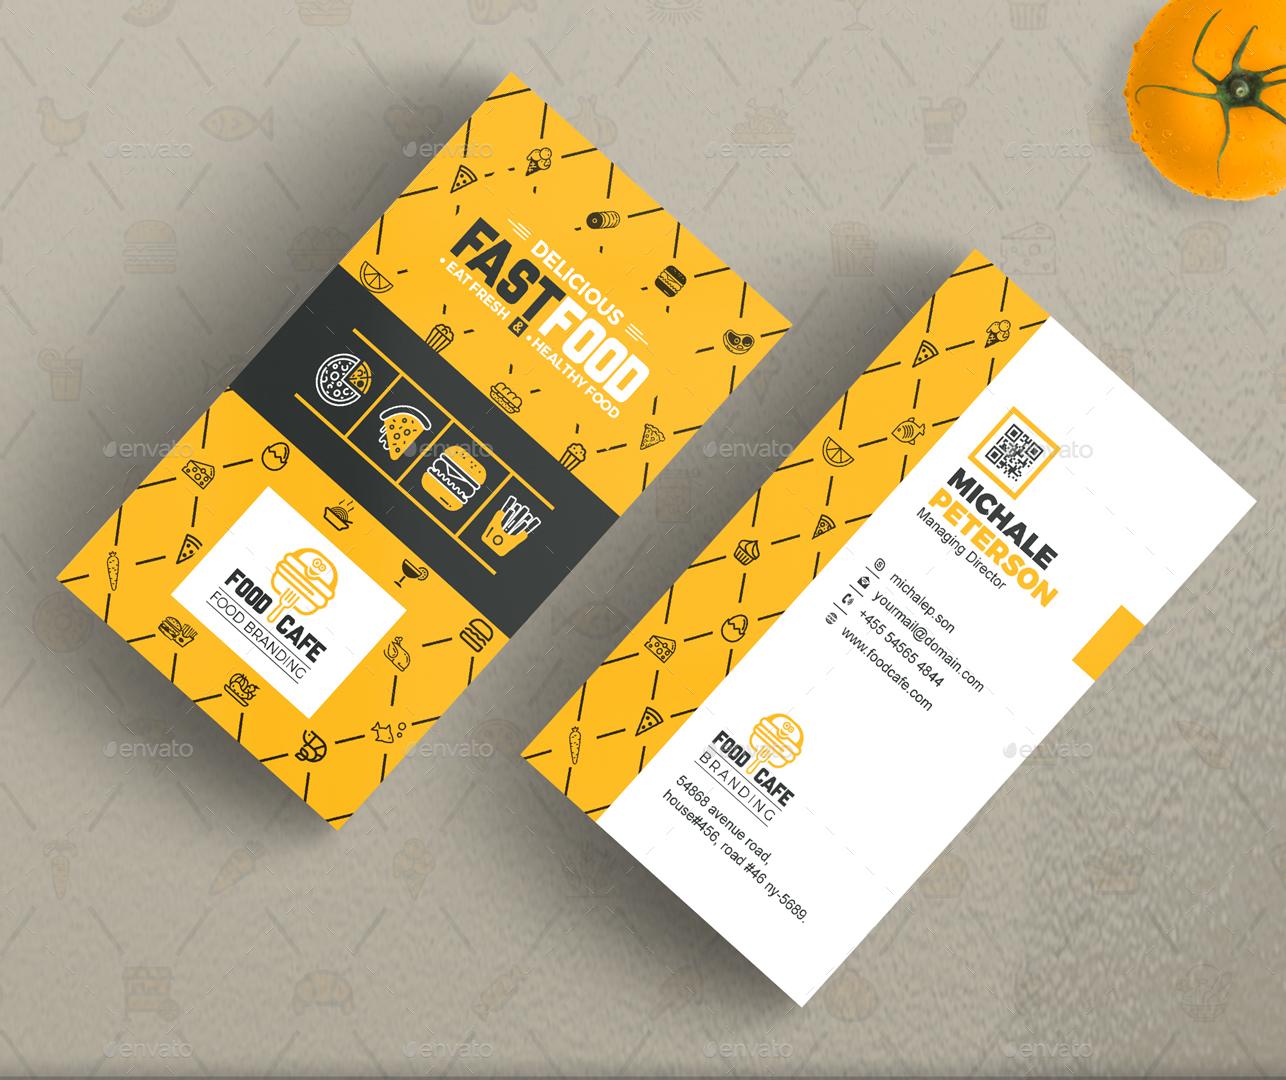 Business card designs restaurants gallery card design and card food business card template 100 images business cards fast food business card template business card design magicingreecefo Image collections